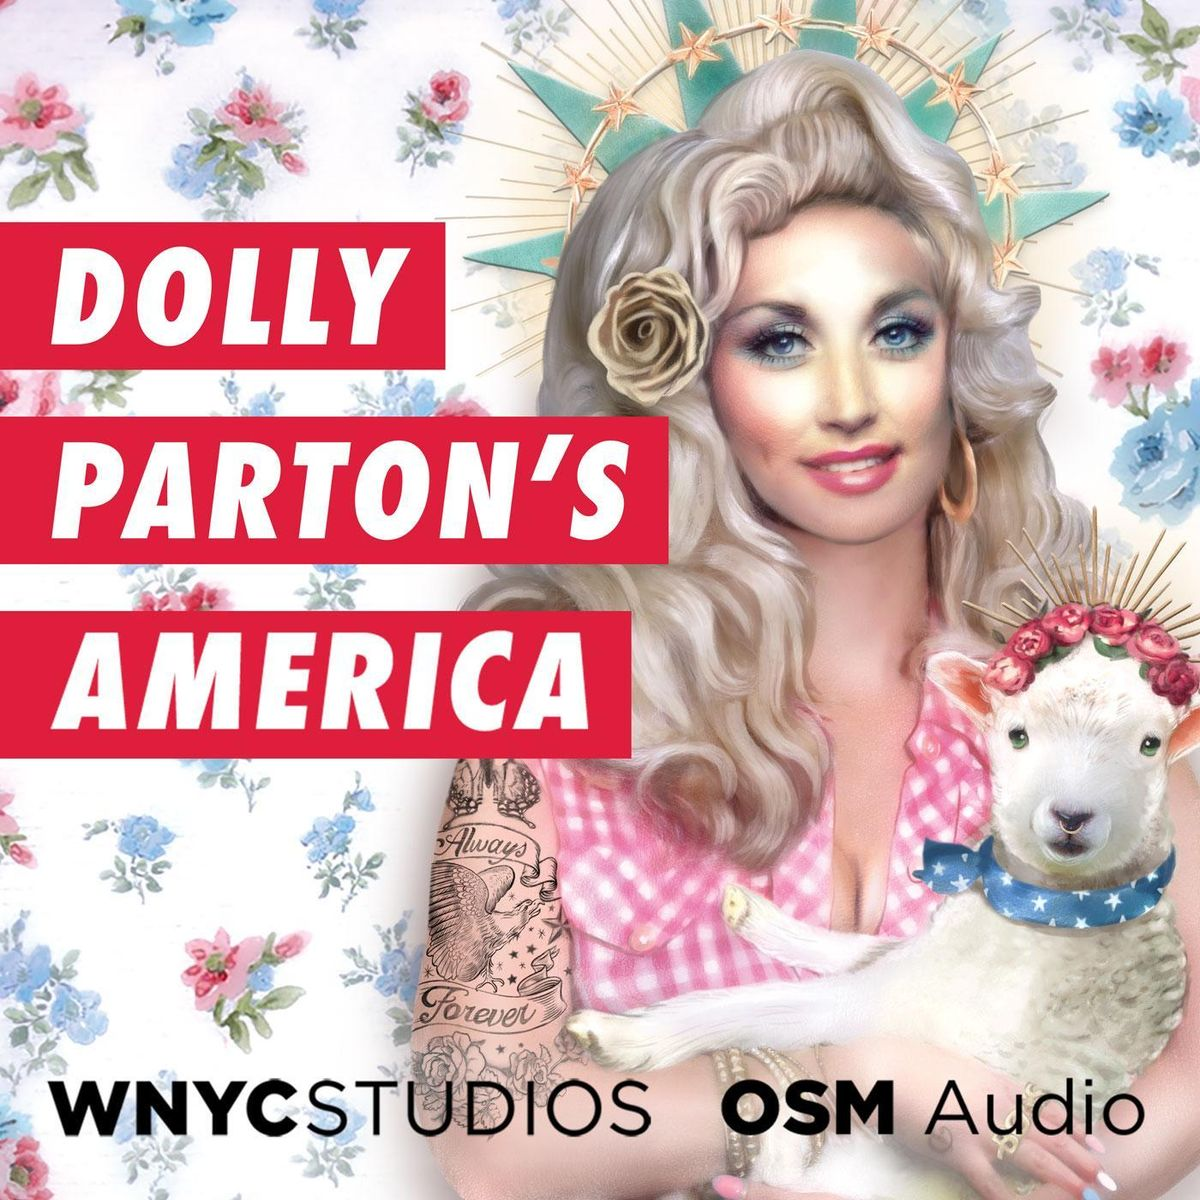 Podcast Dolly Parton's America